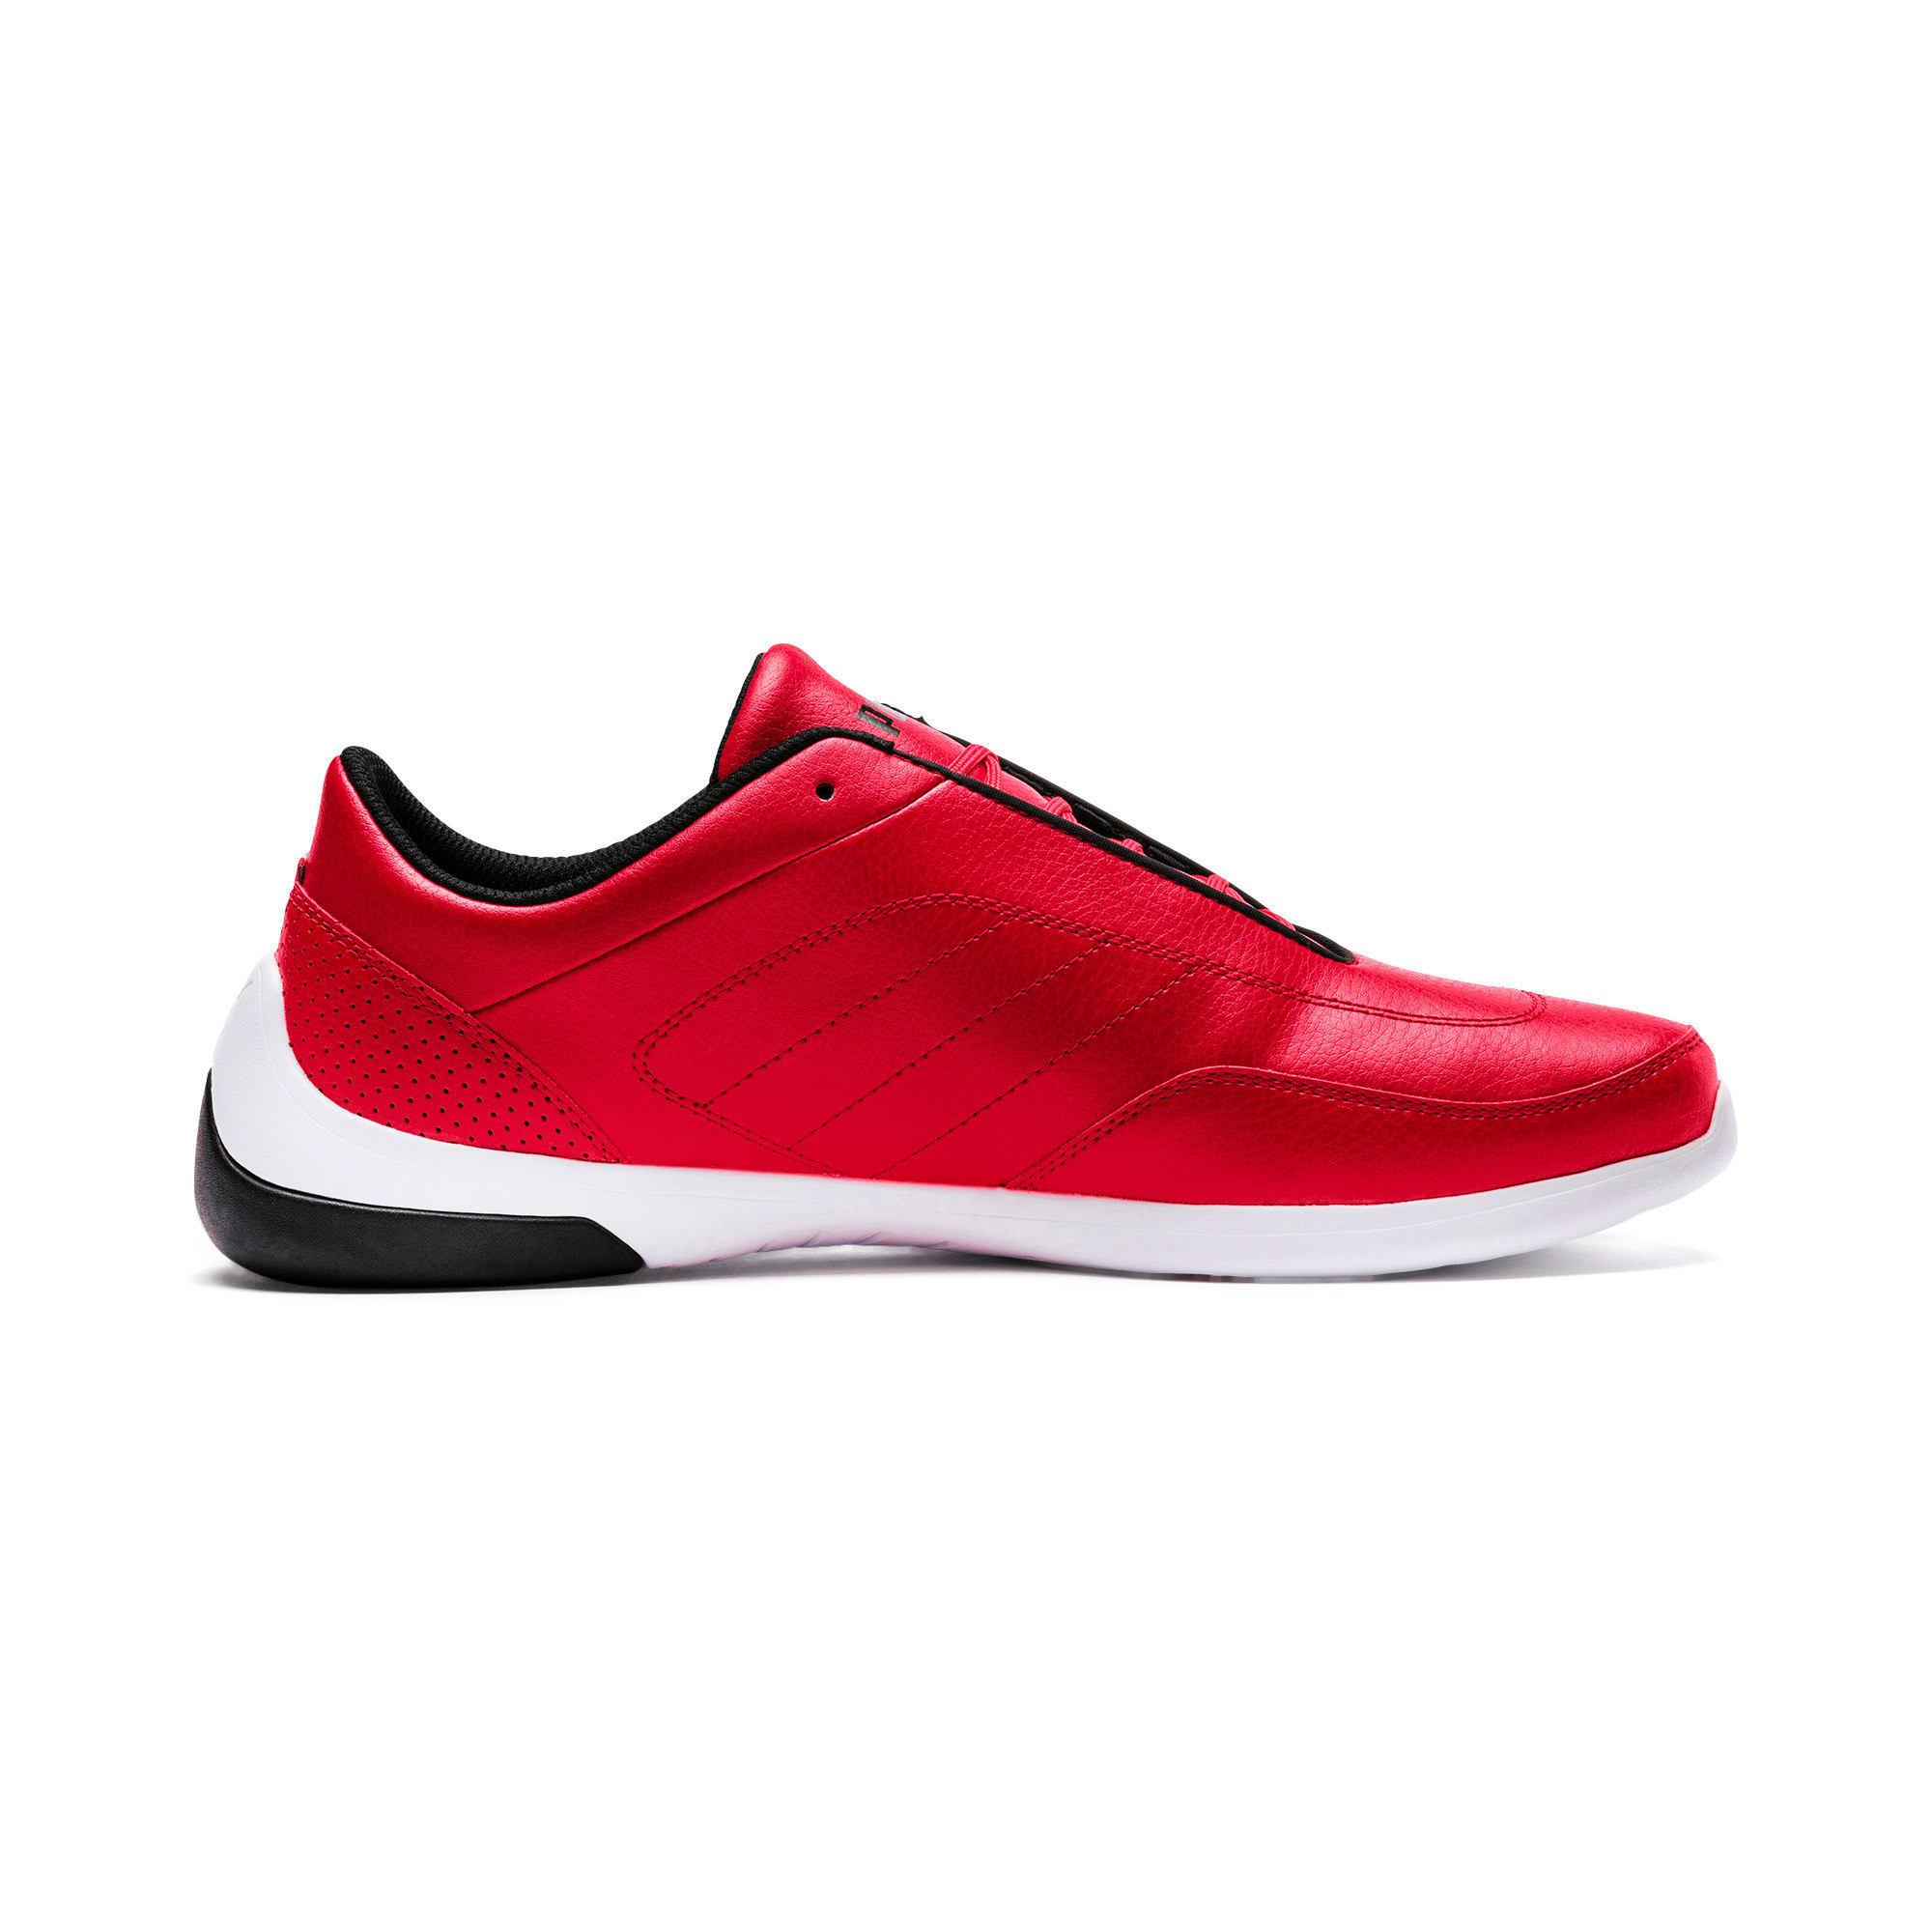 Thumbnail 5 of Scuderia Ferrari Kart Cat III Shoes, Rosso Corsa-Puma White, medium